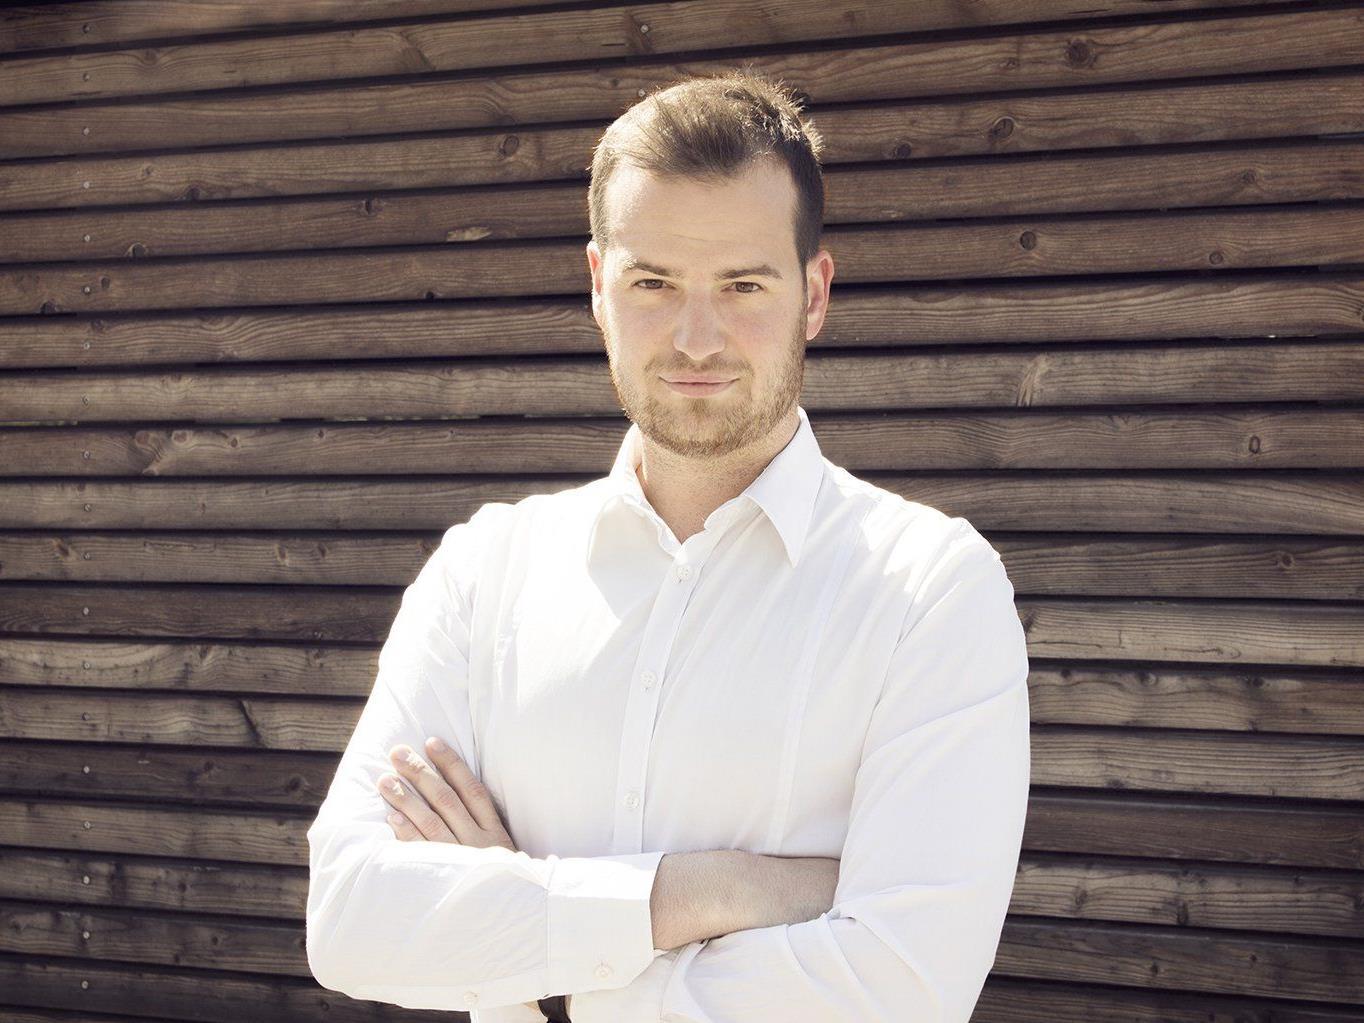 Johannes Terler (28) ist neuer Digital Consultant bei TOWA.